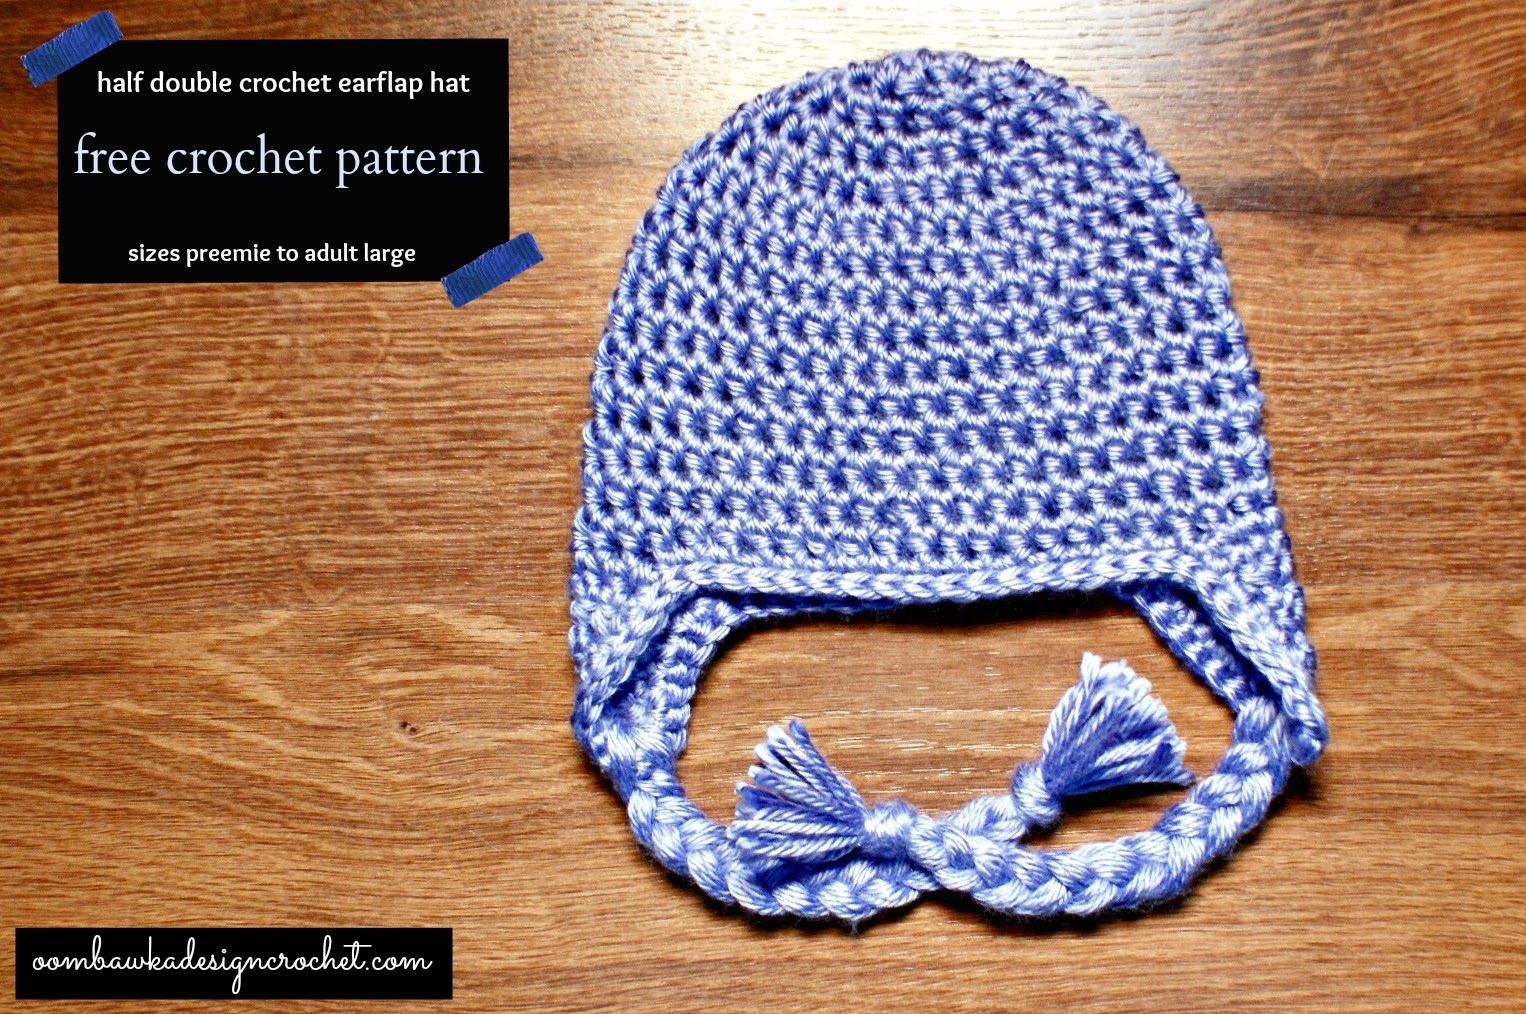 Pin On Cre8tion Crochet Community Board